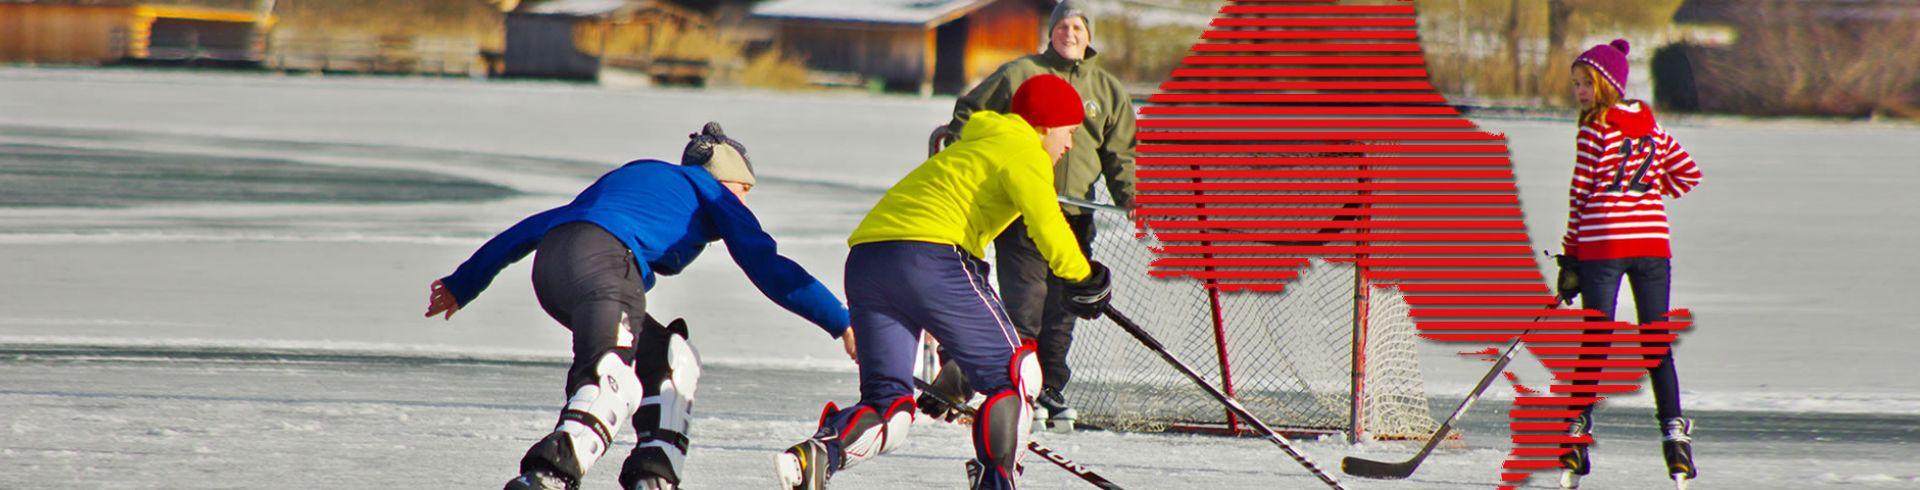 Programs - Outdoor hockey game